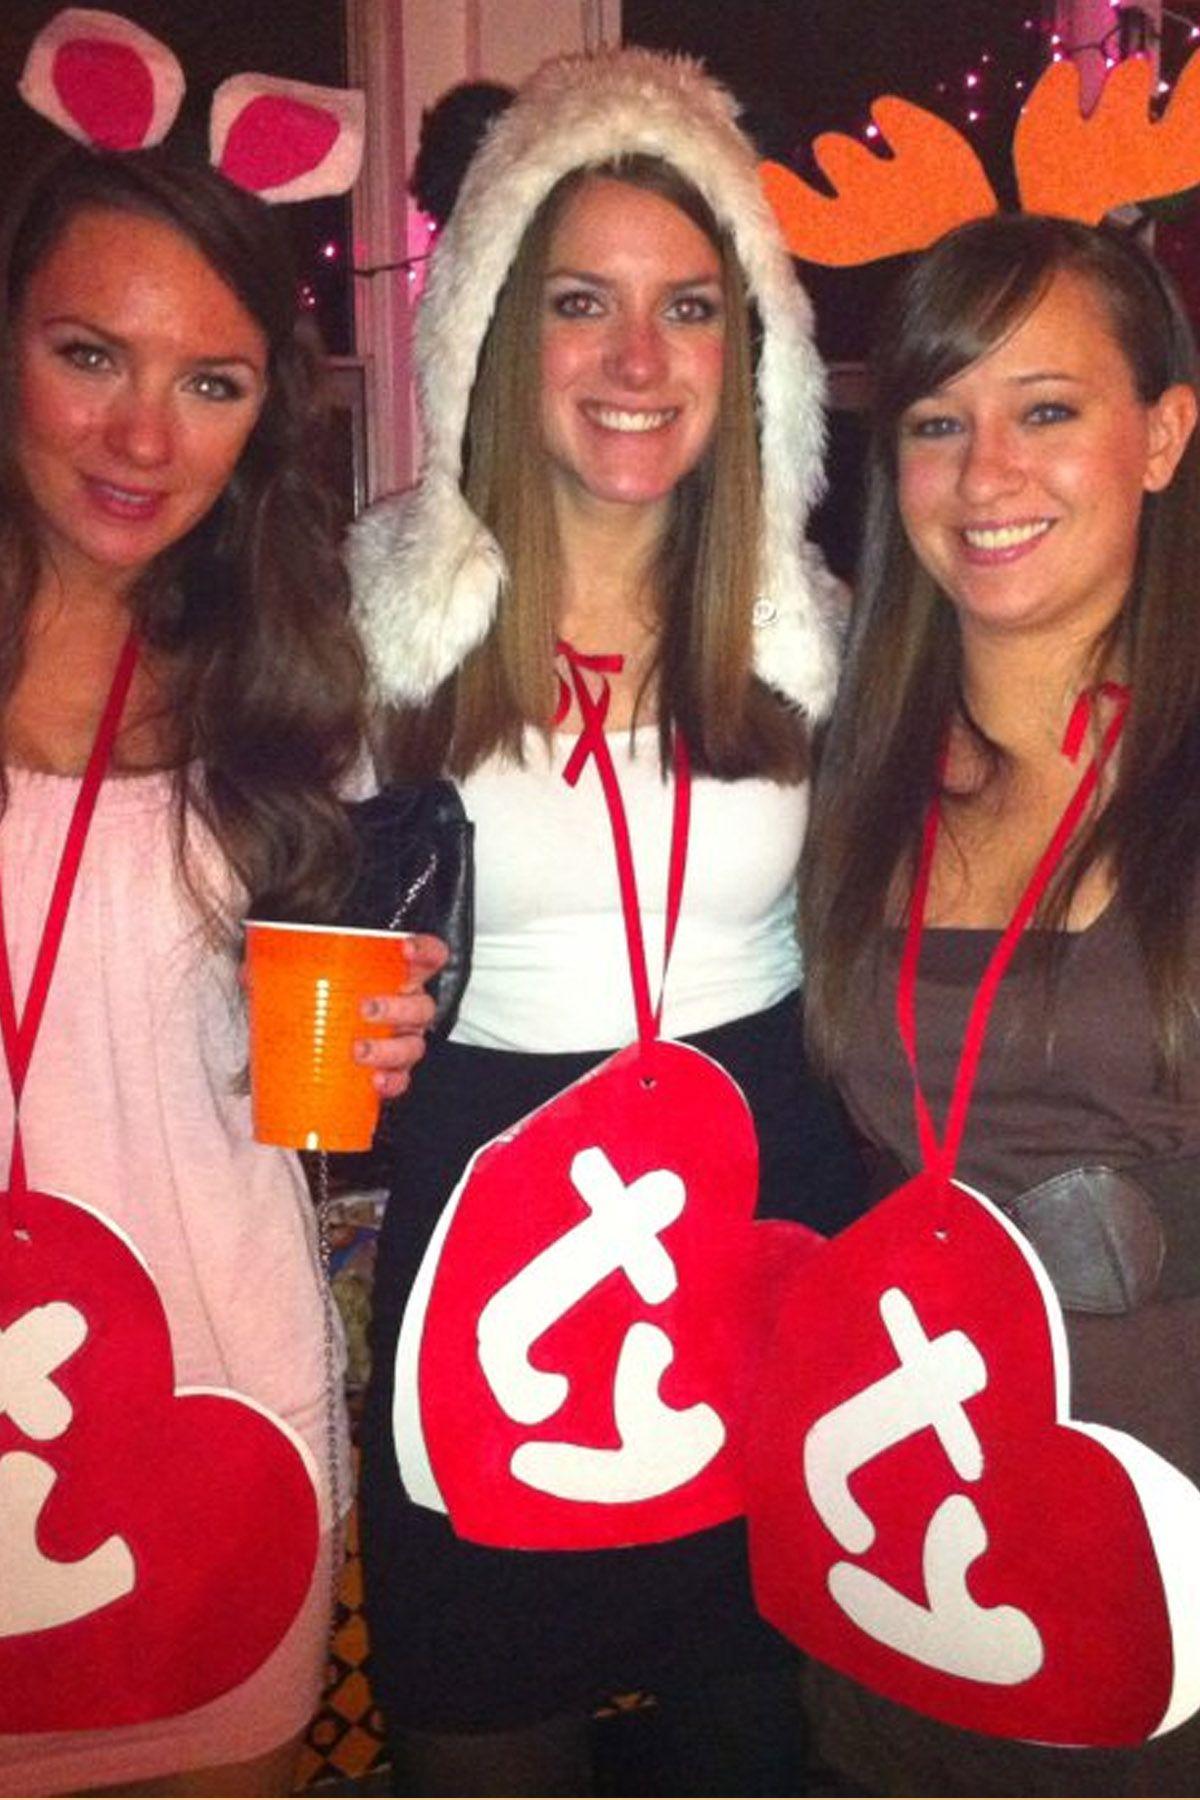 6a7efc894ef 25 Cute Group Halloween Costume Ideas - Easy DIY Friend Halloween Costumes